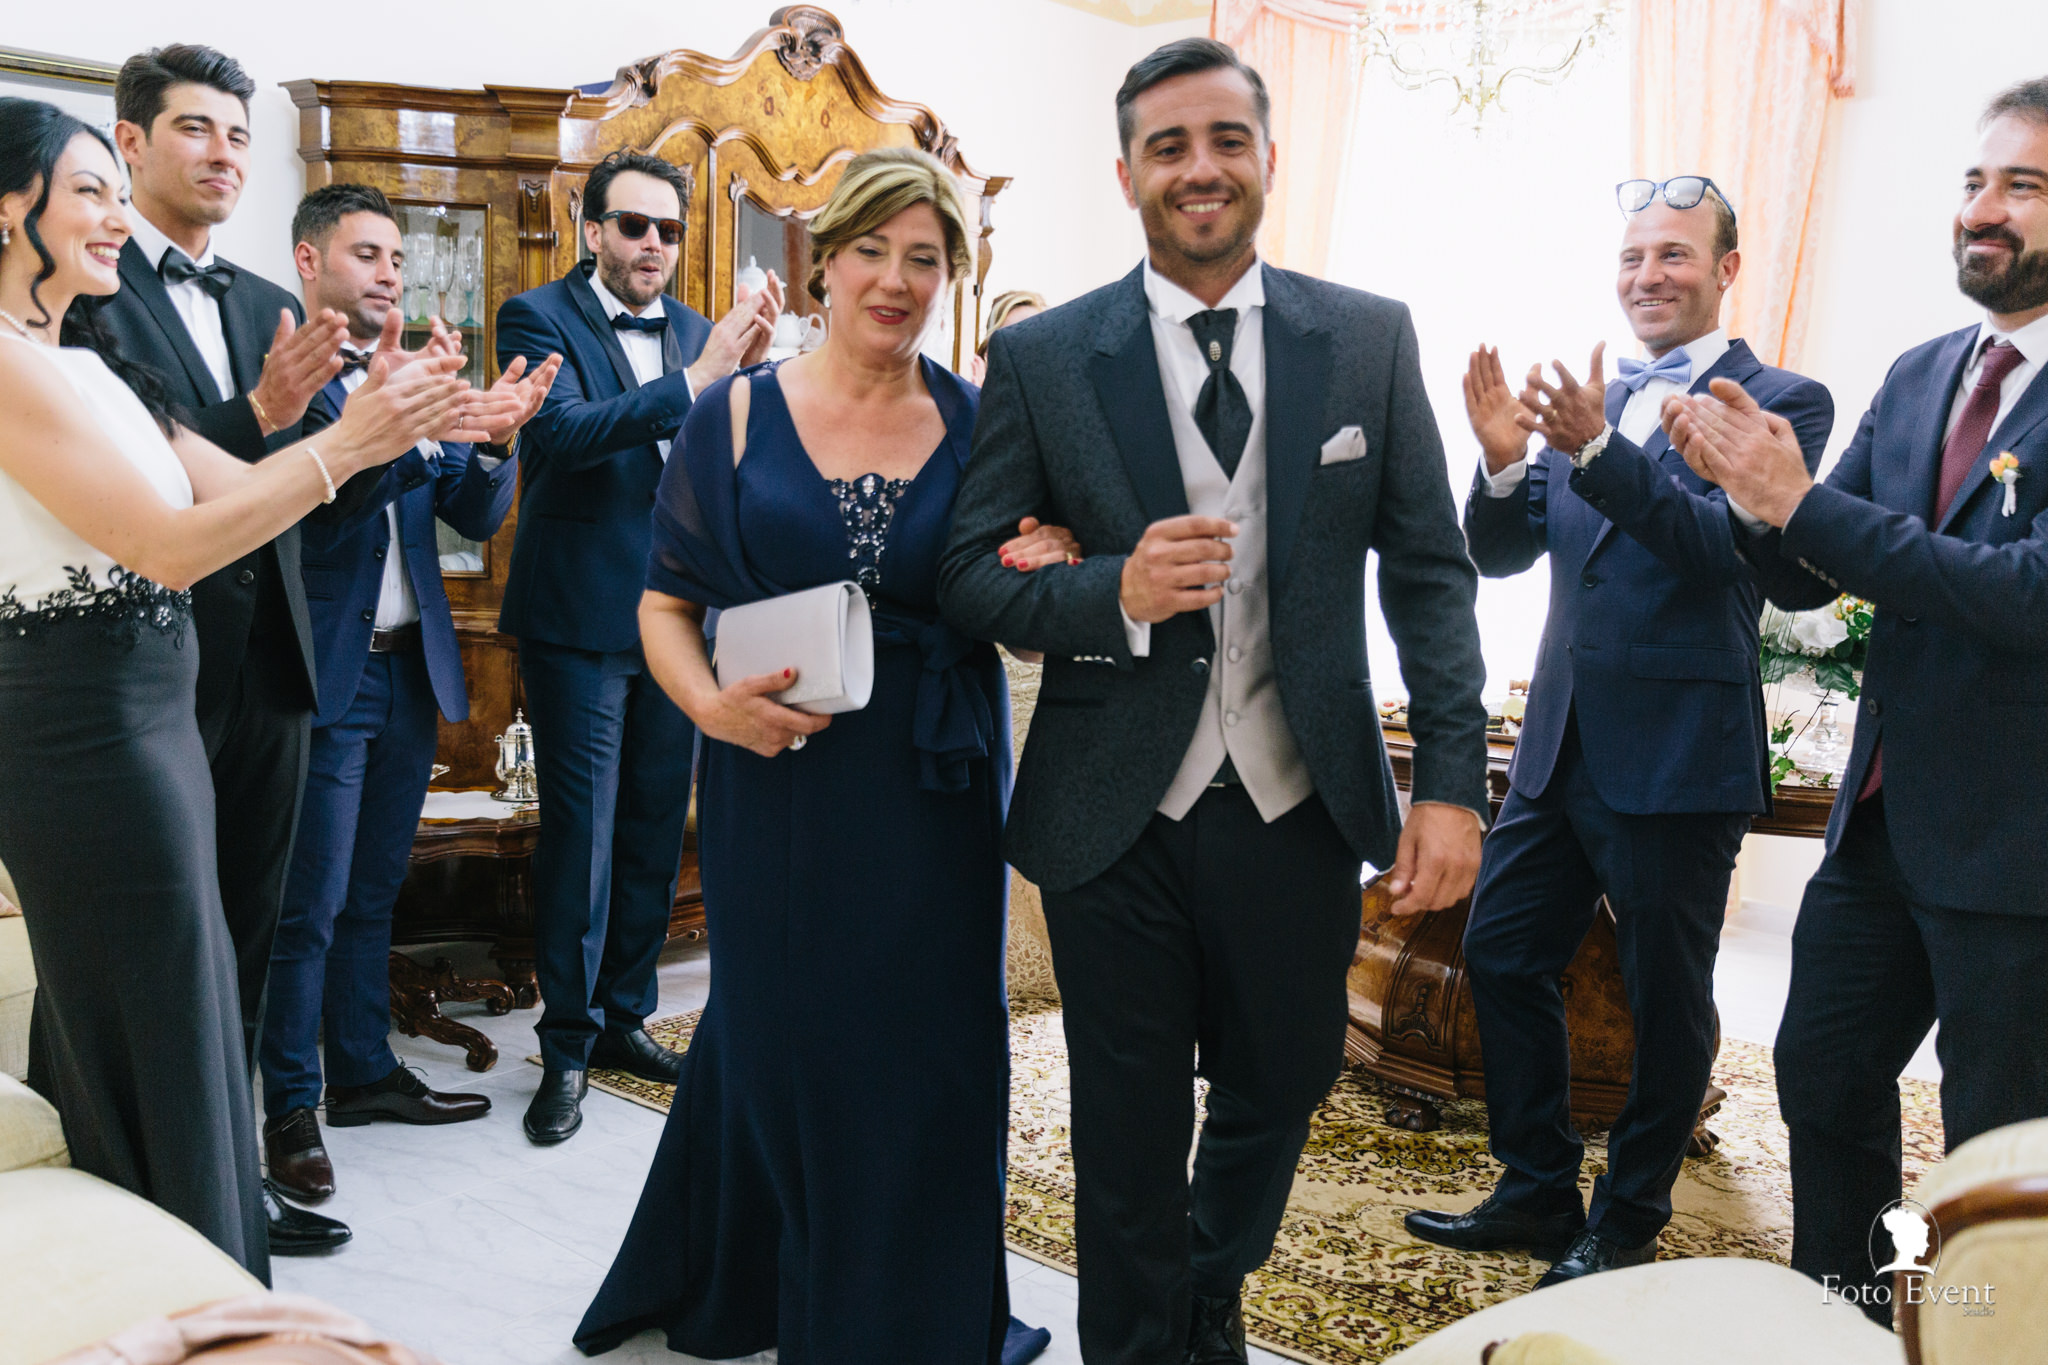 006-2019-06-12-Matrimonio-Rosa-e-Angelo-Ripellino-5DE-374